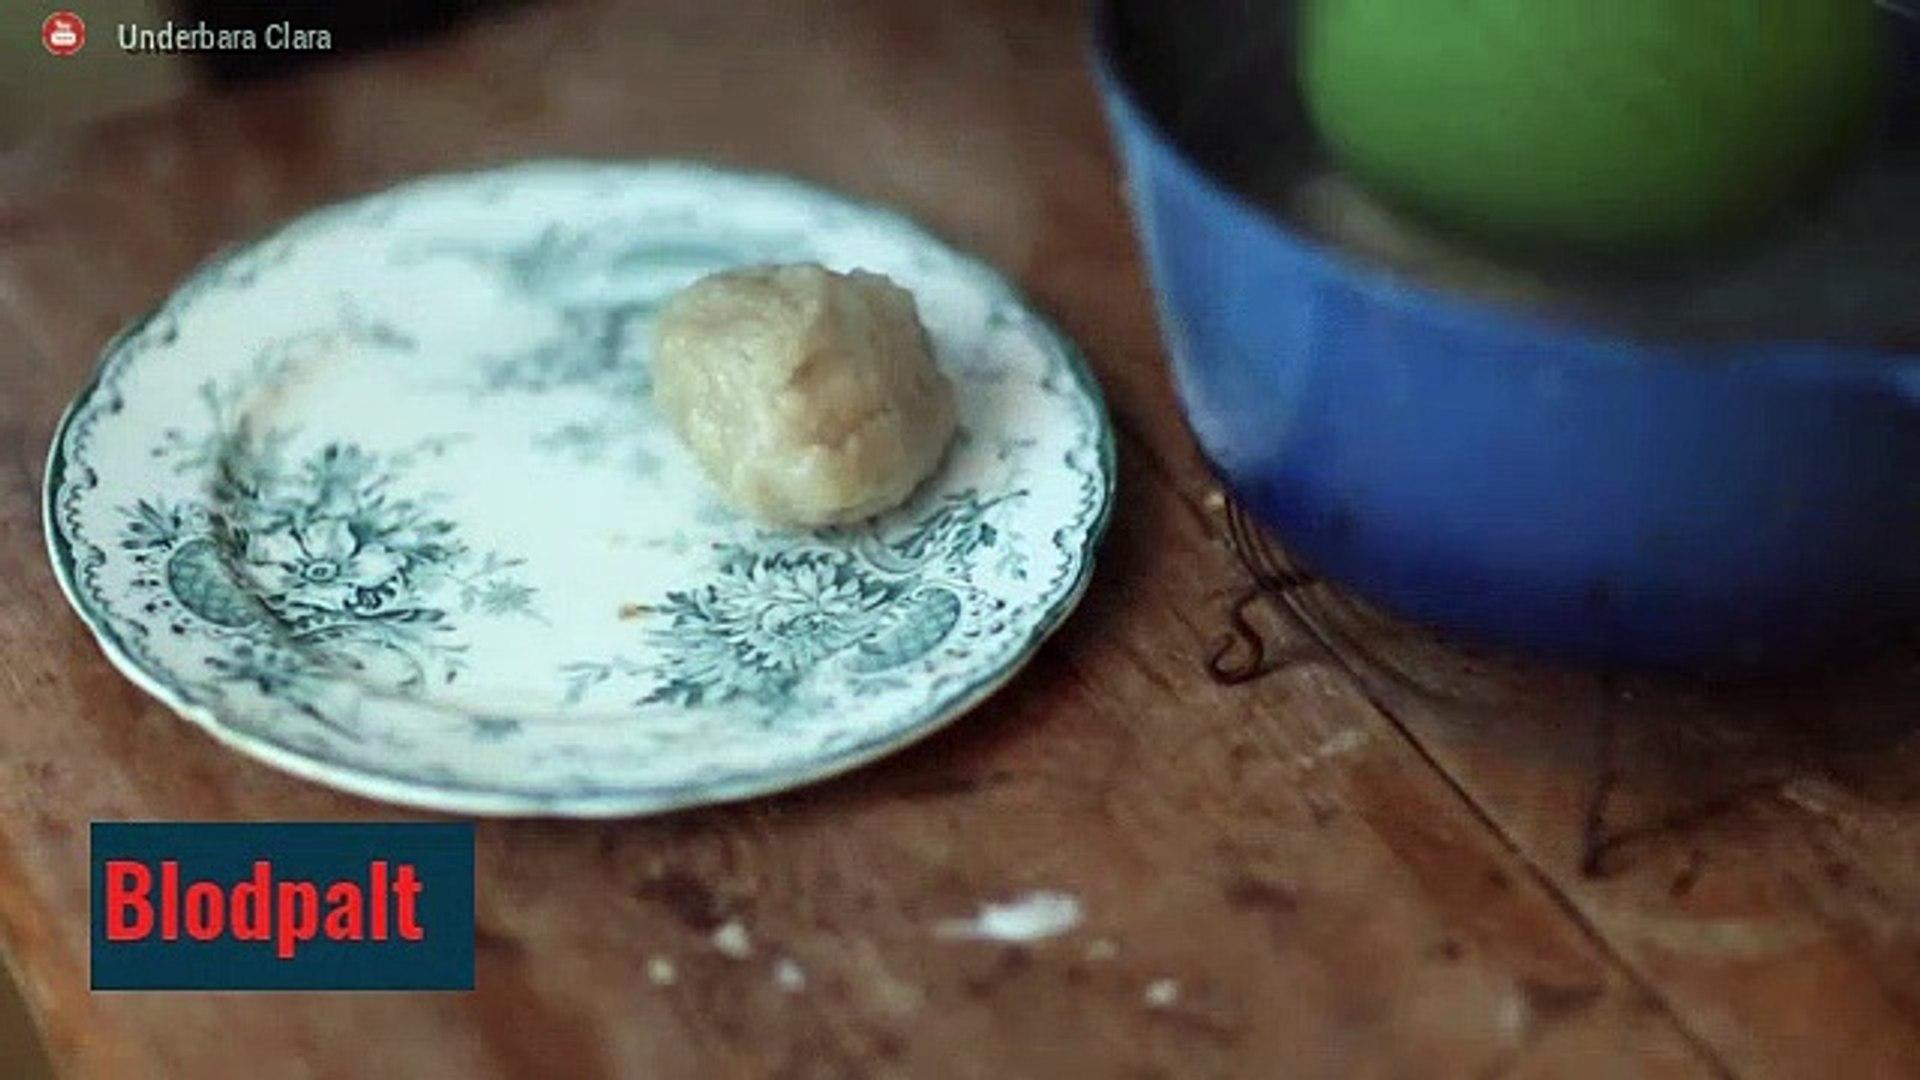 Gastronomía de Suecia: Blodpalt y Smörgåstårta